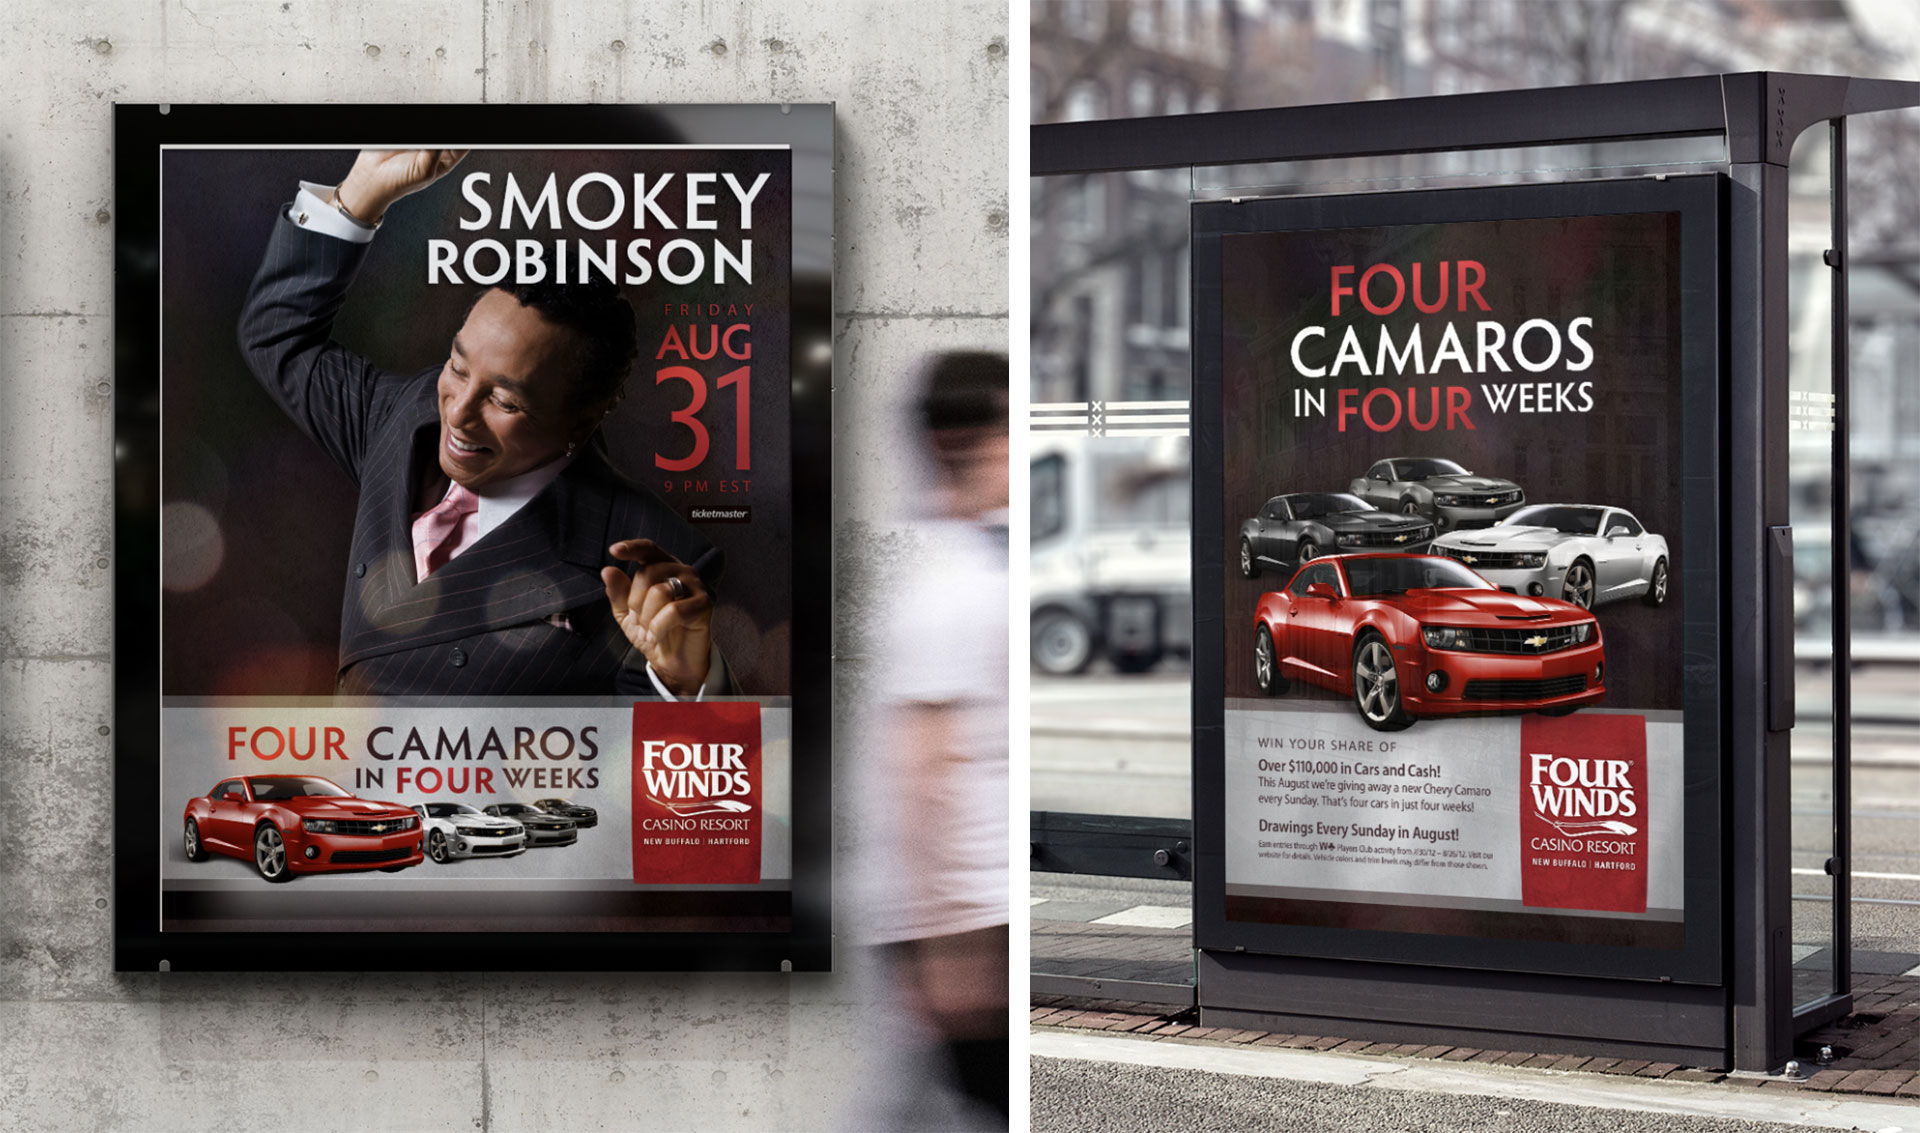 Four Winds Casino Campaign